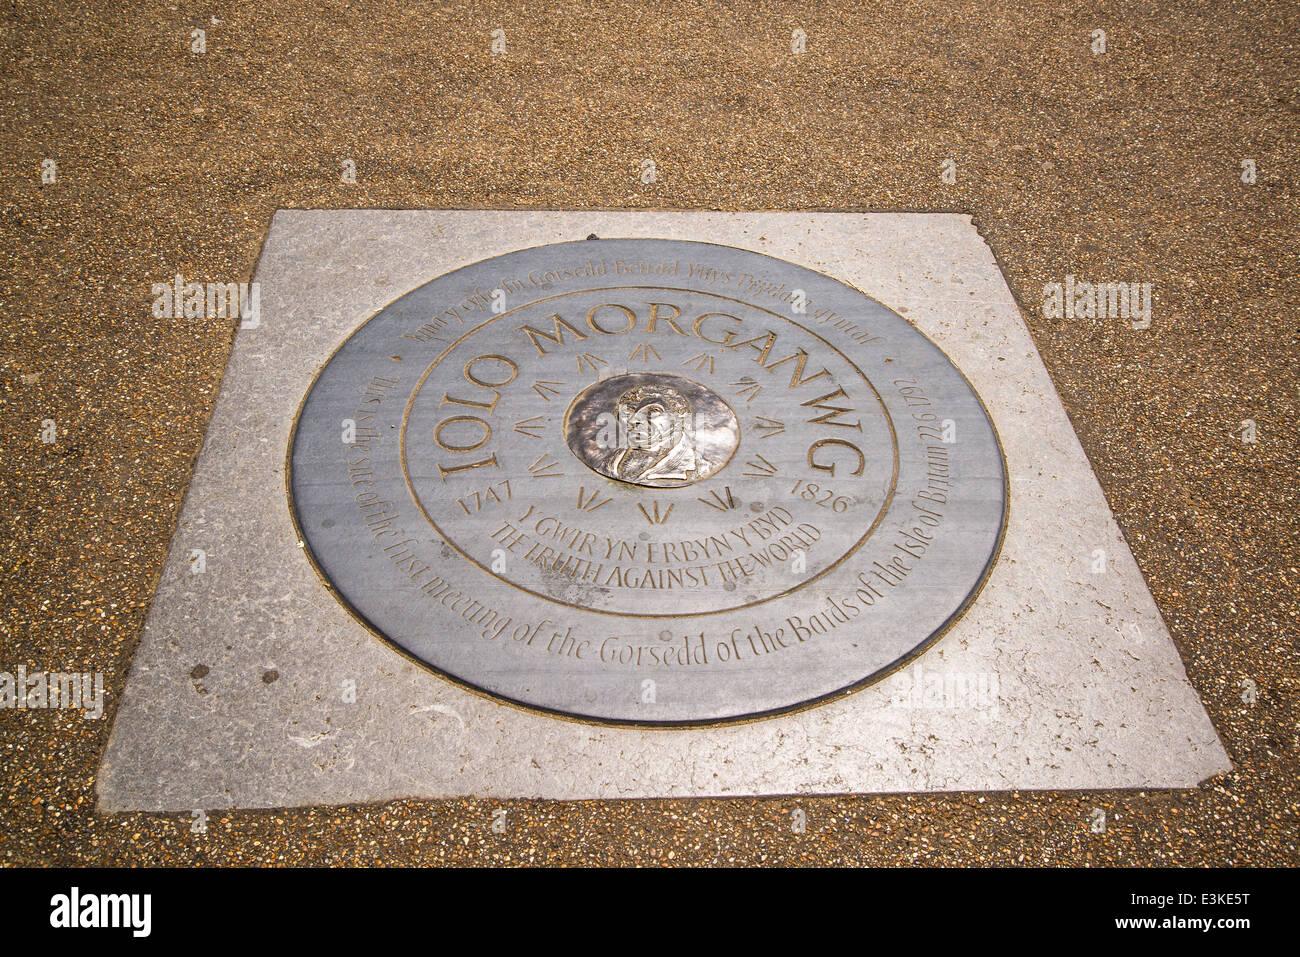 Iolo Morganwg stone memorial plaque, Primrose Hill, London, England, UK - Stock Image